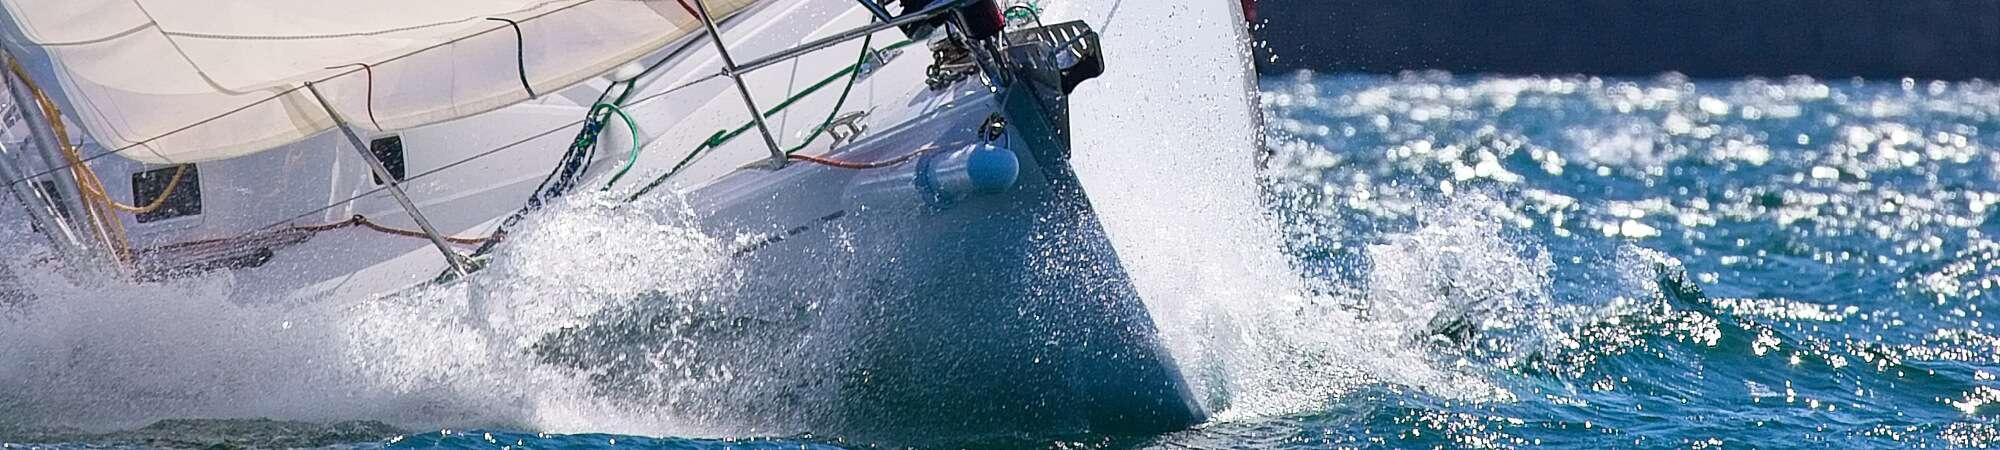 GYC Banner Yacht